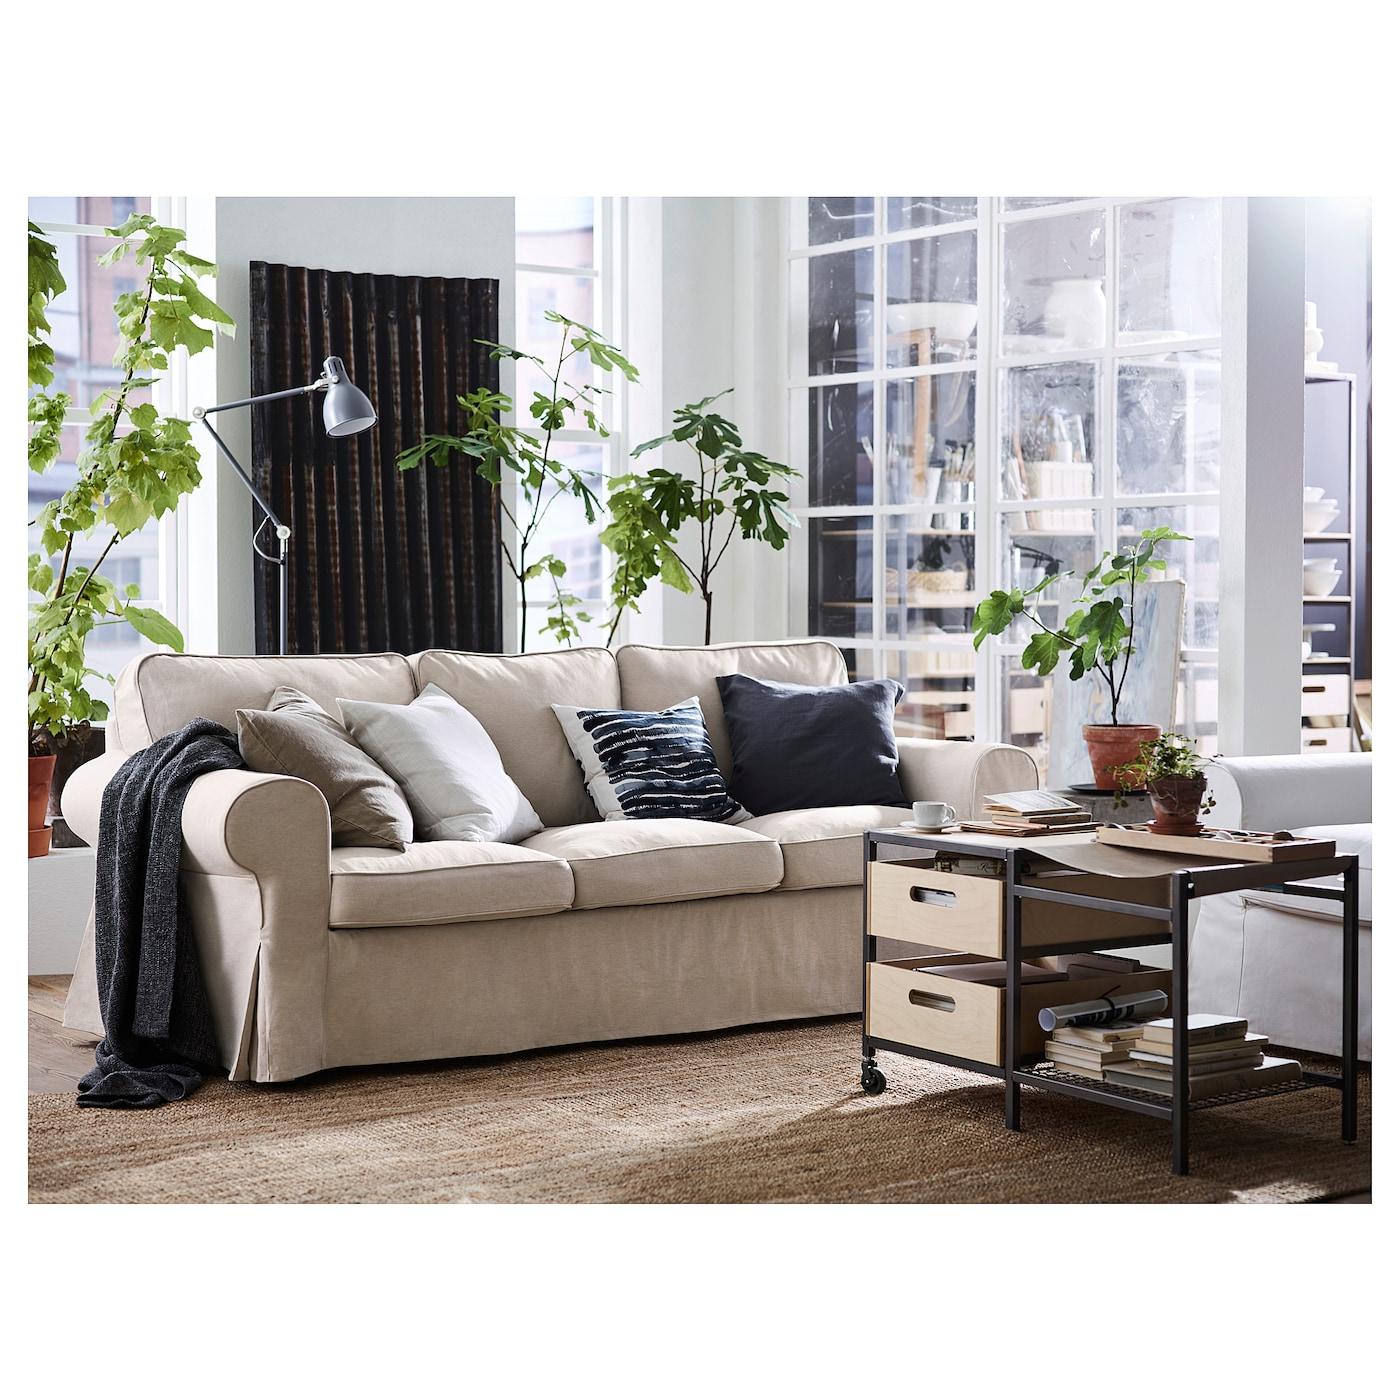 EKTORP Three-seat sofa - Lofallet beige